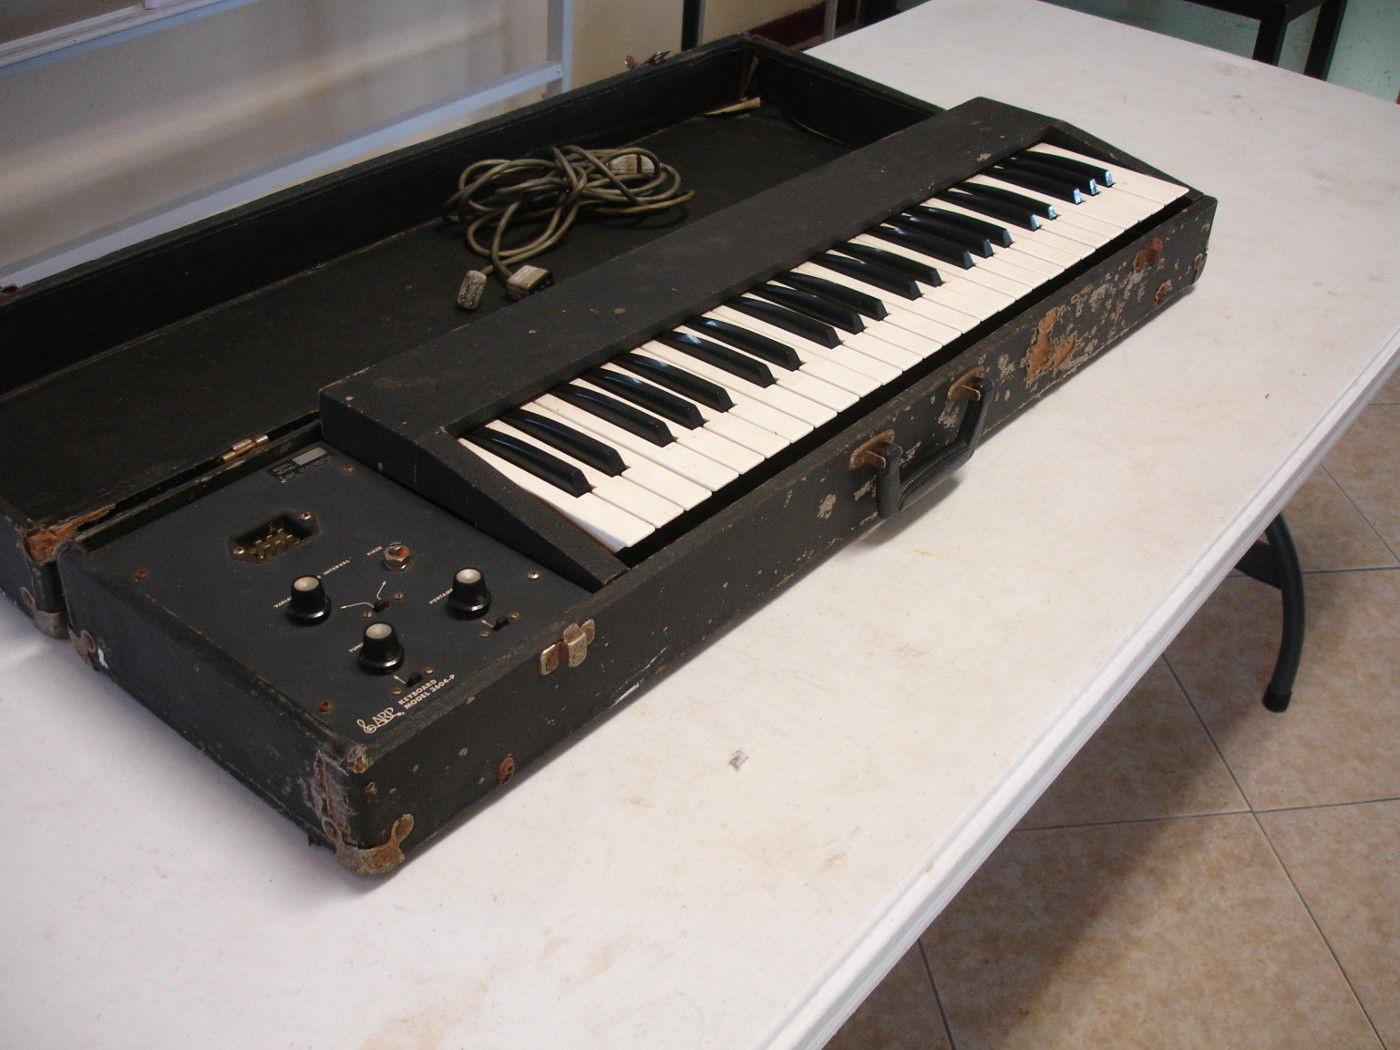 MATRIXSYNTH: ARP 2600-P Analog Synthesizer & 3604-P ...